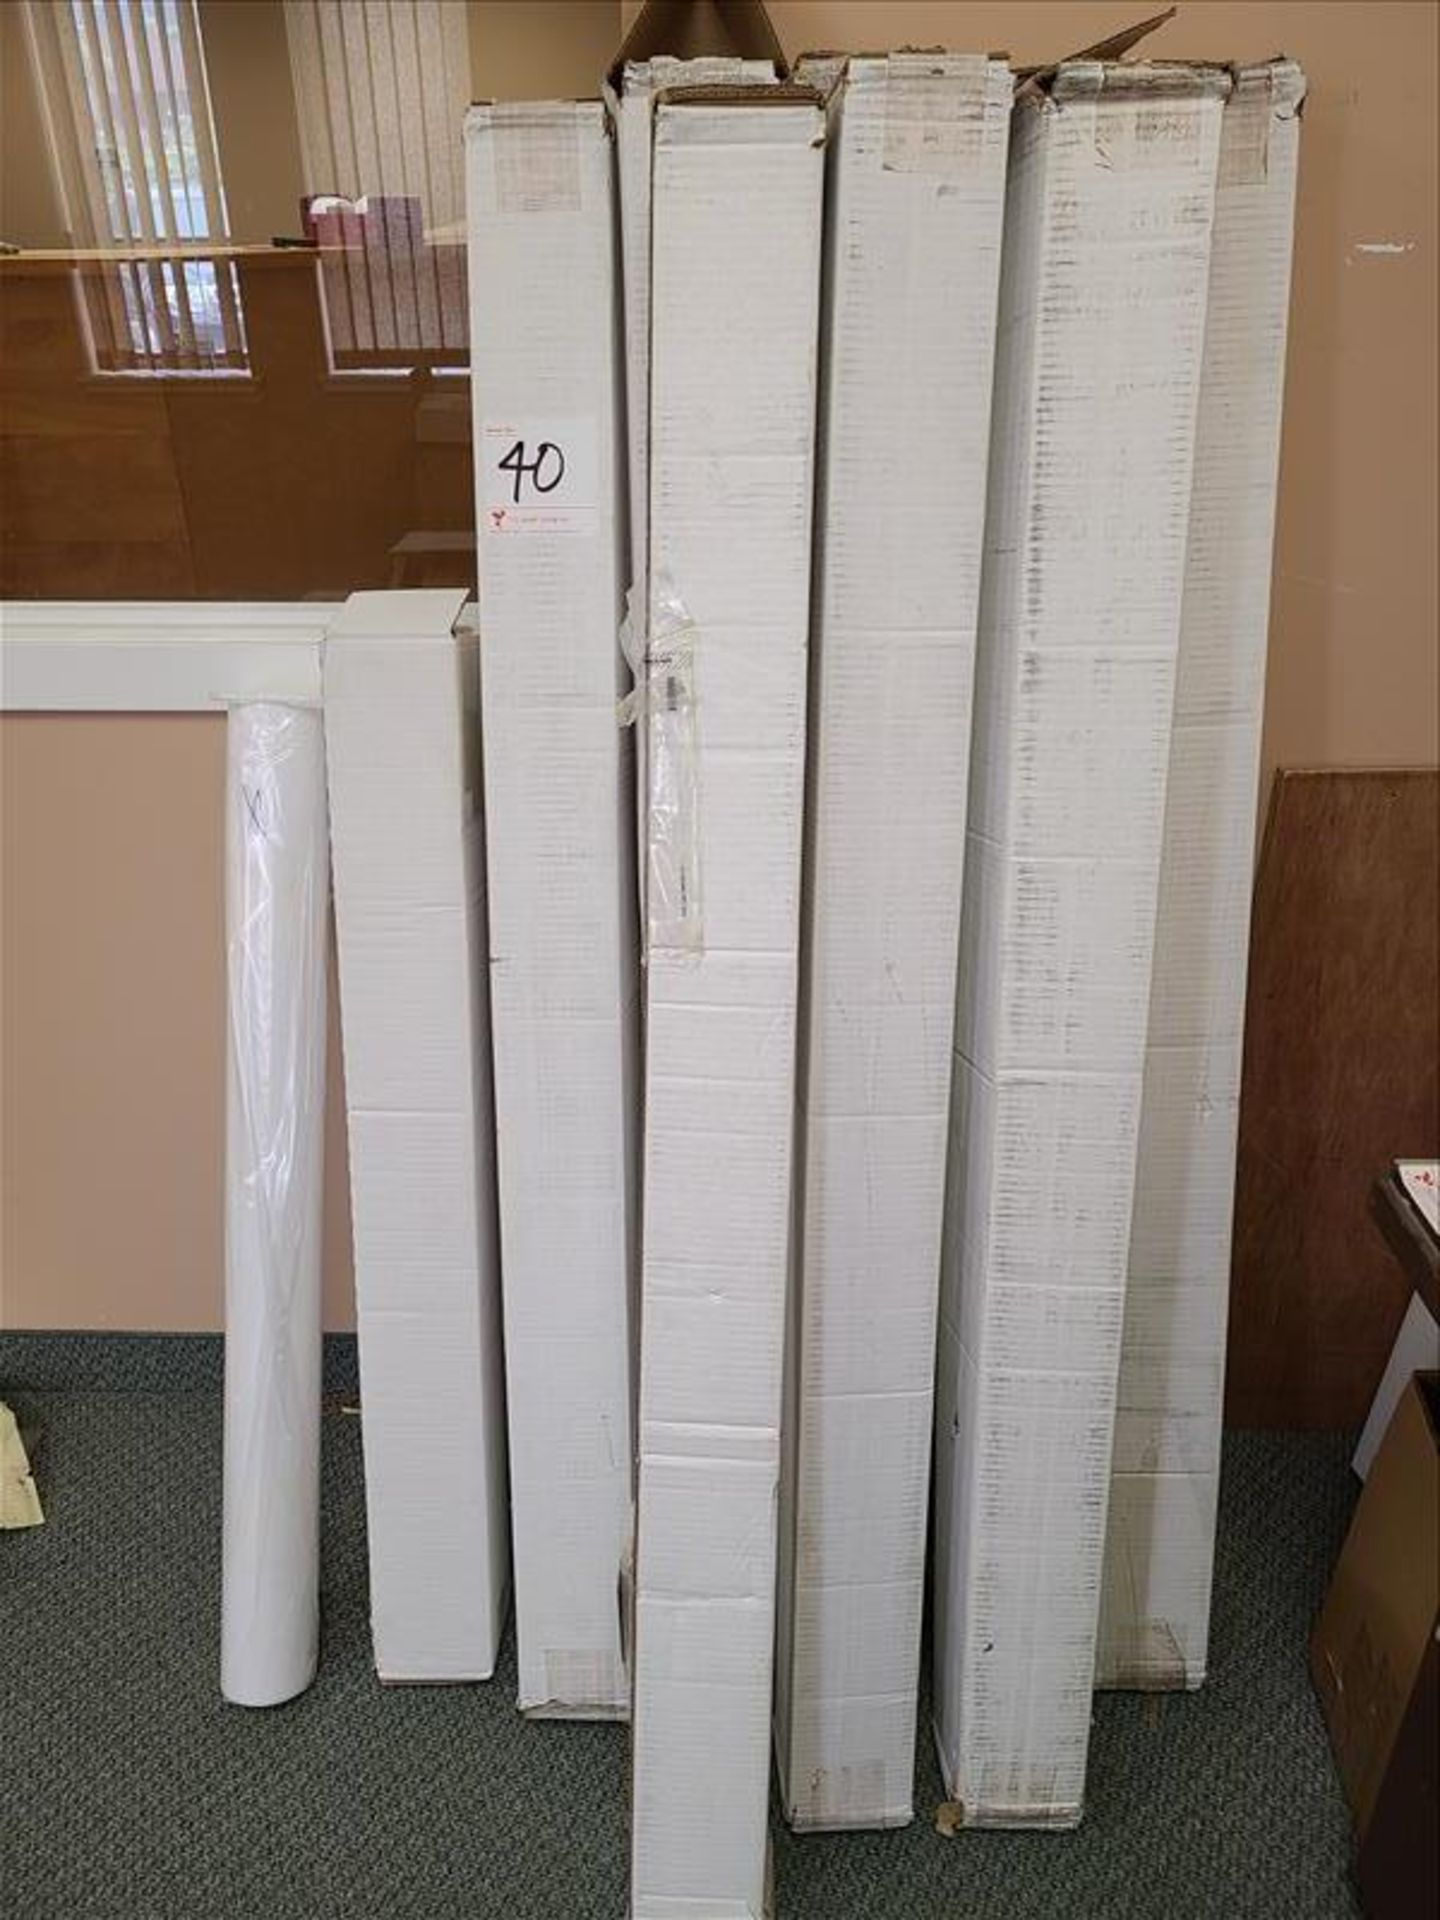 Misc. Lot Rolls of Paper